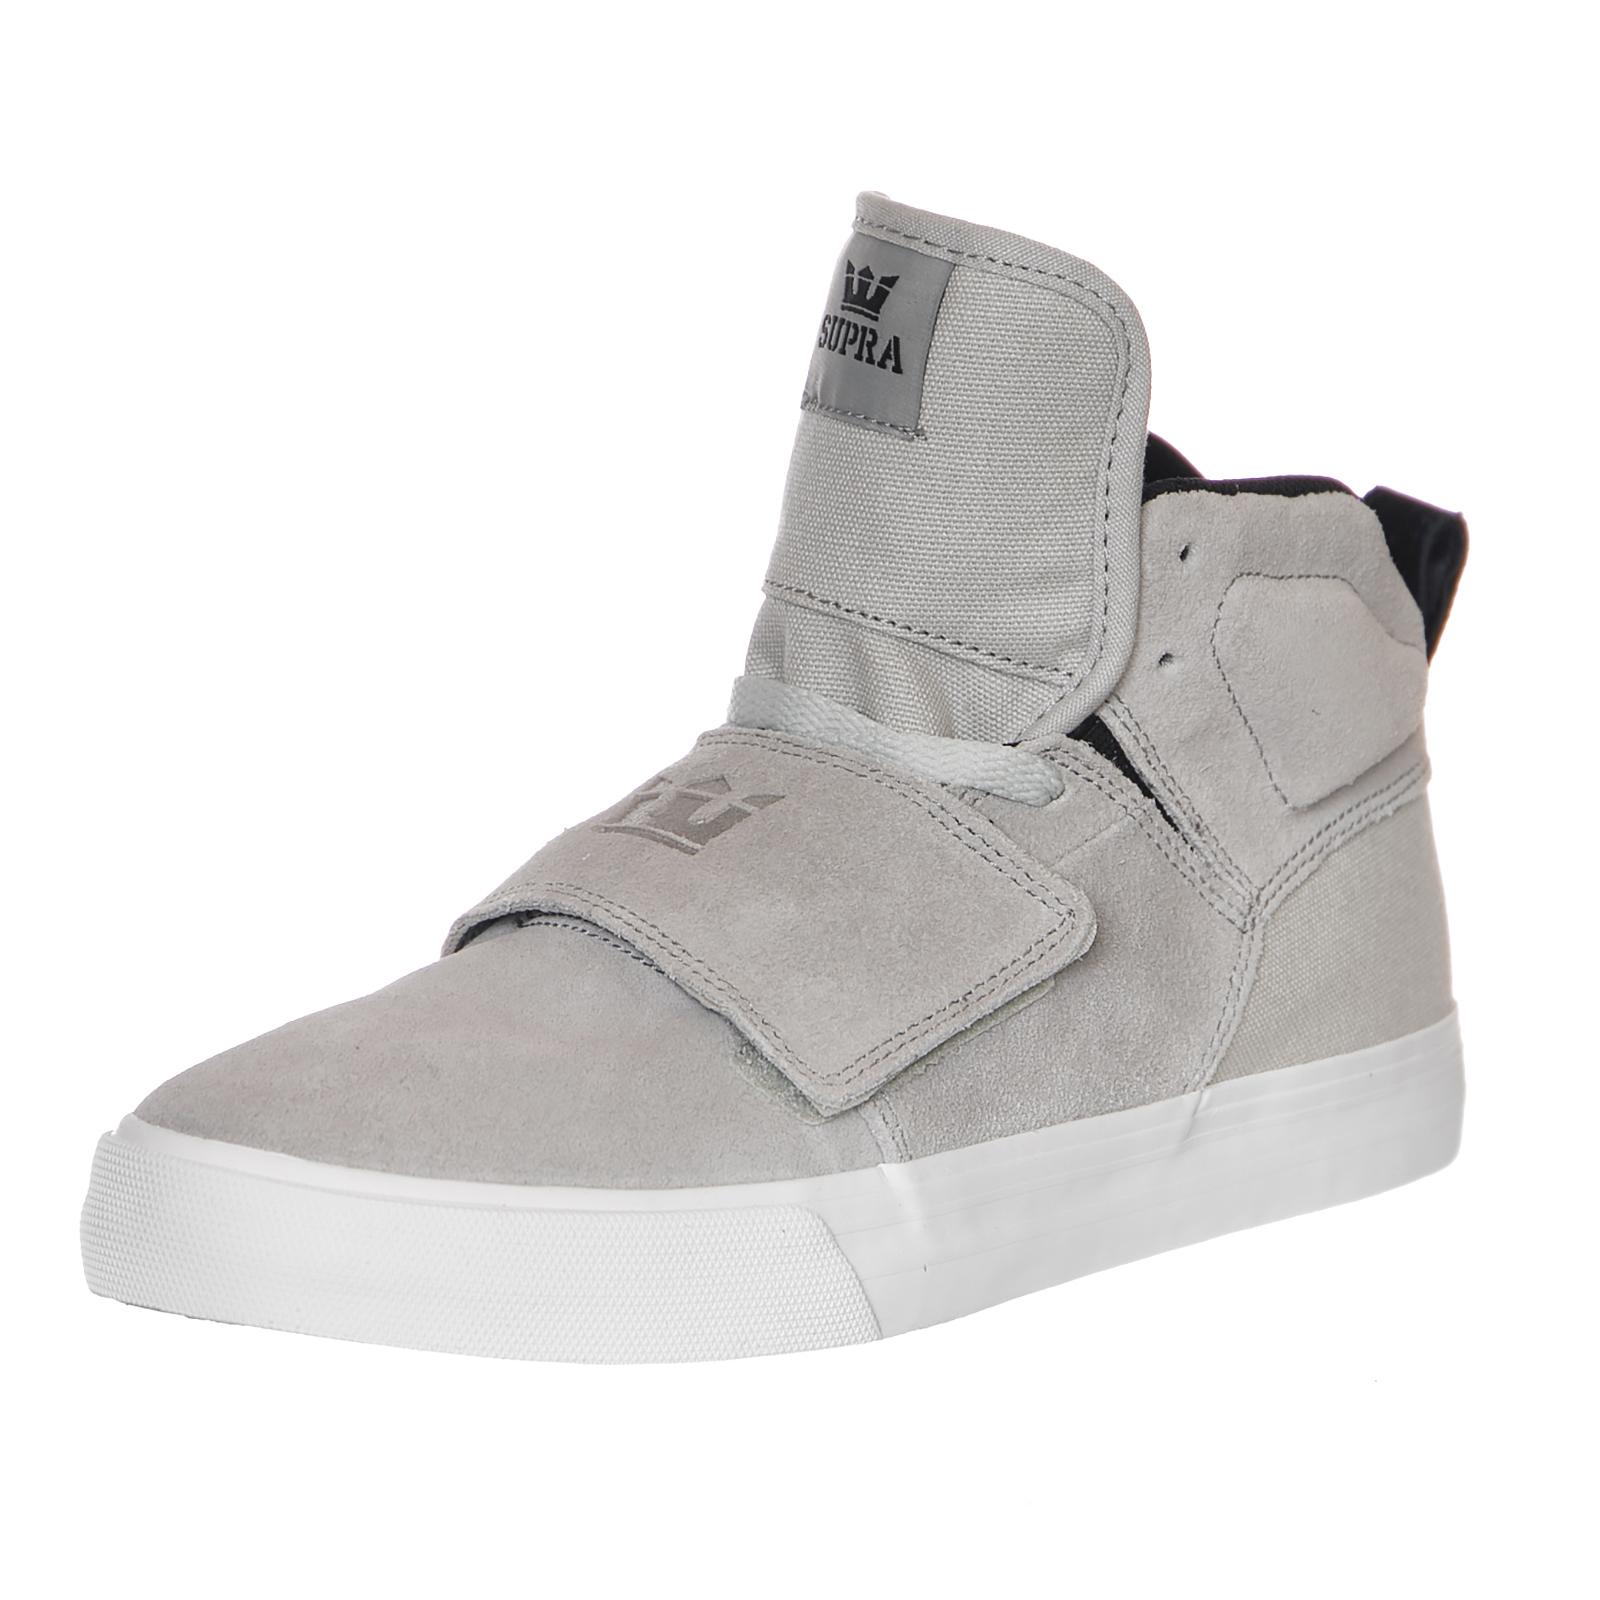 Supra -blanc Sneakers Rock Lt. Gris -blanc Supra Cornerstone Grigio ed1ca2